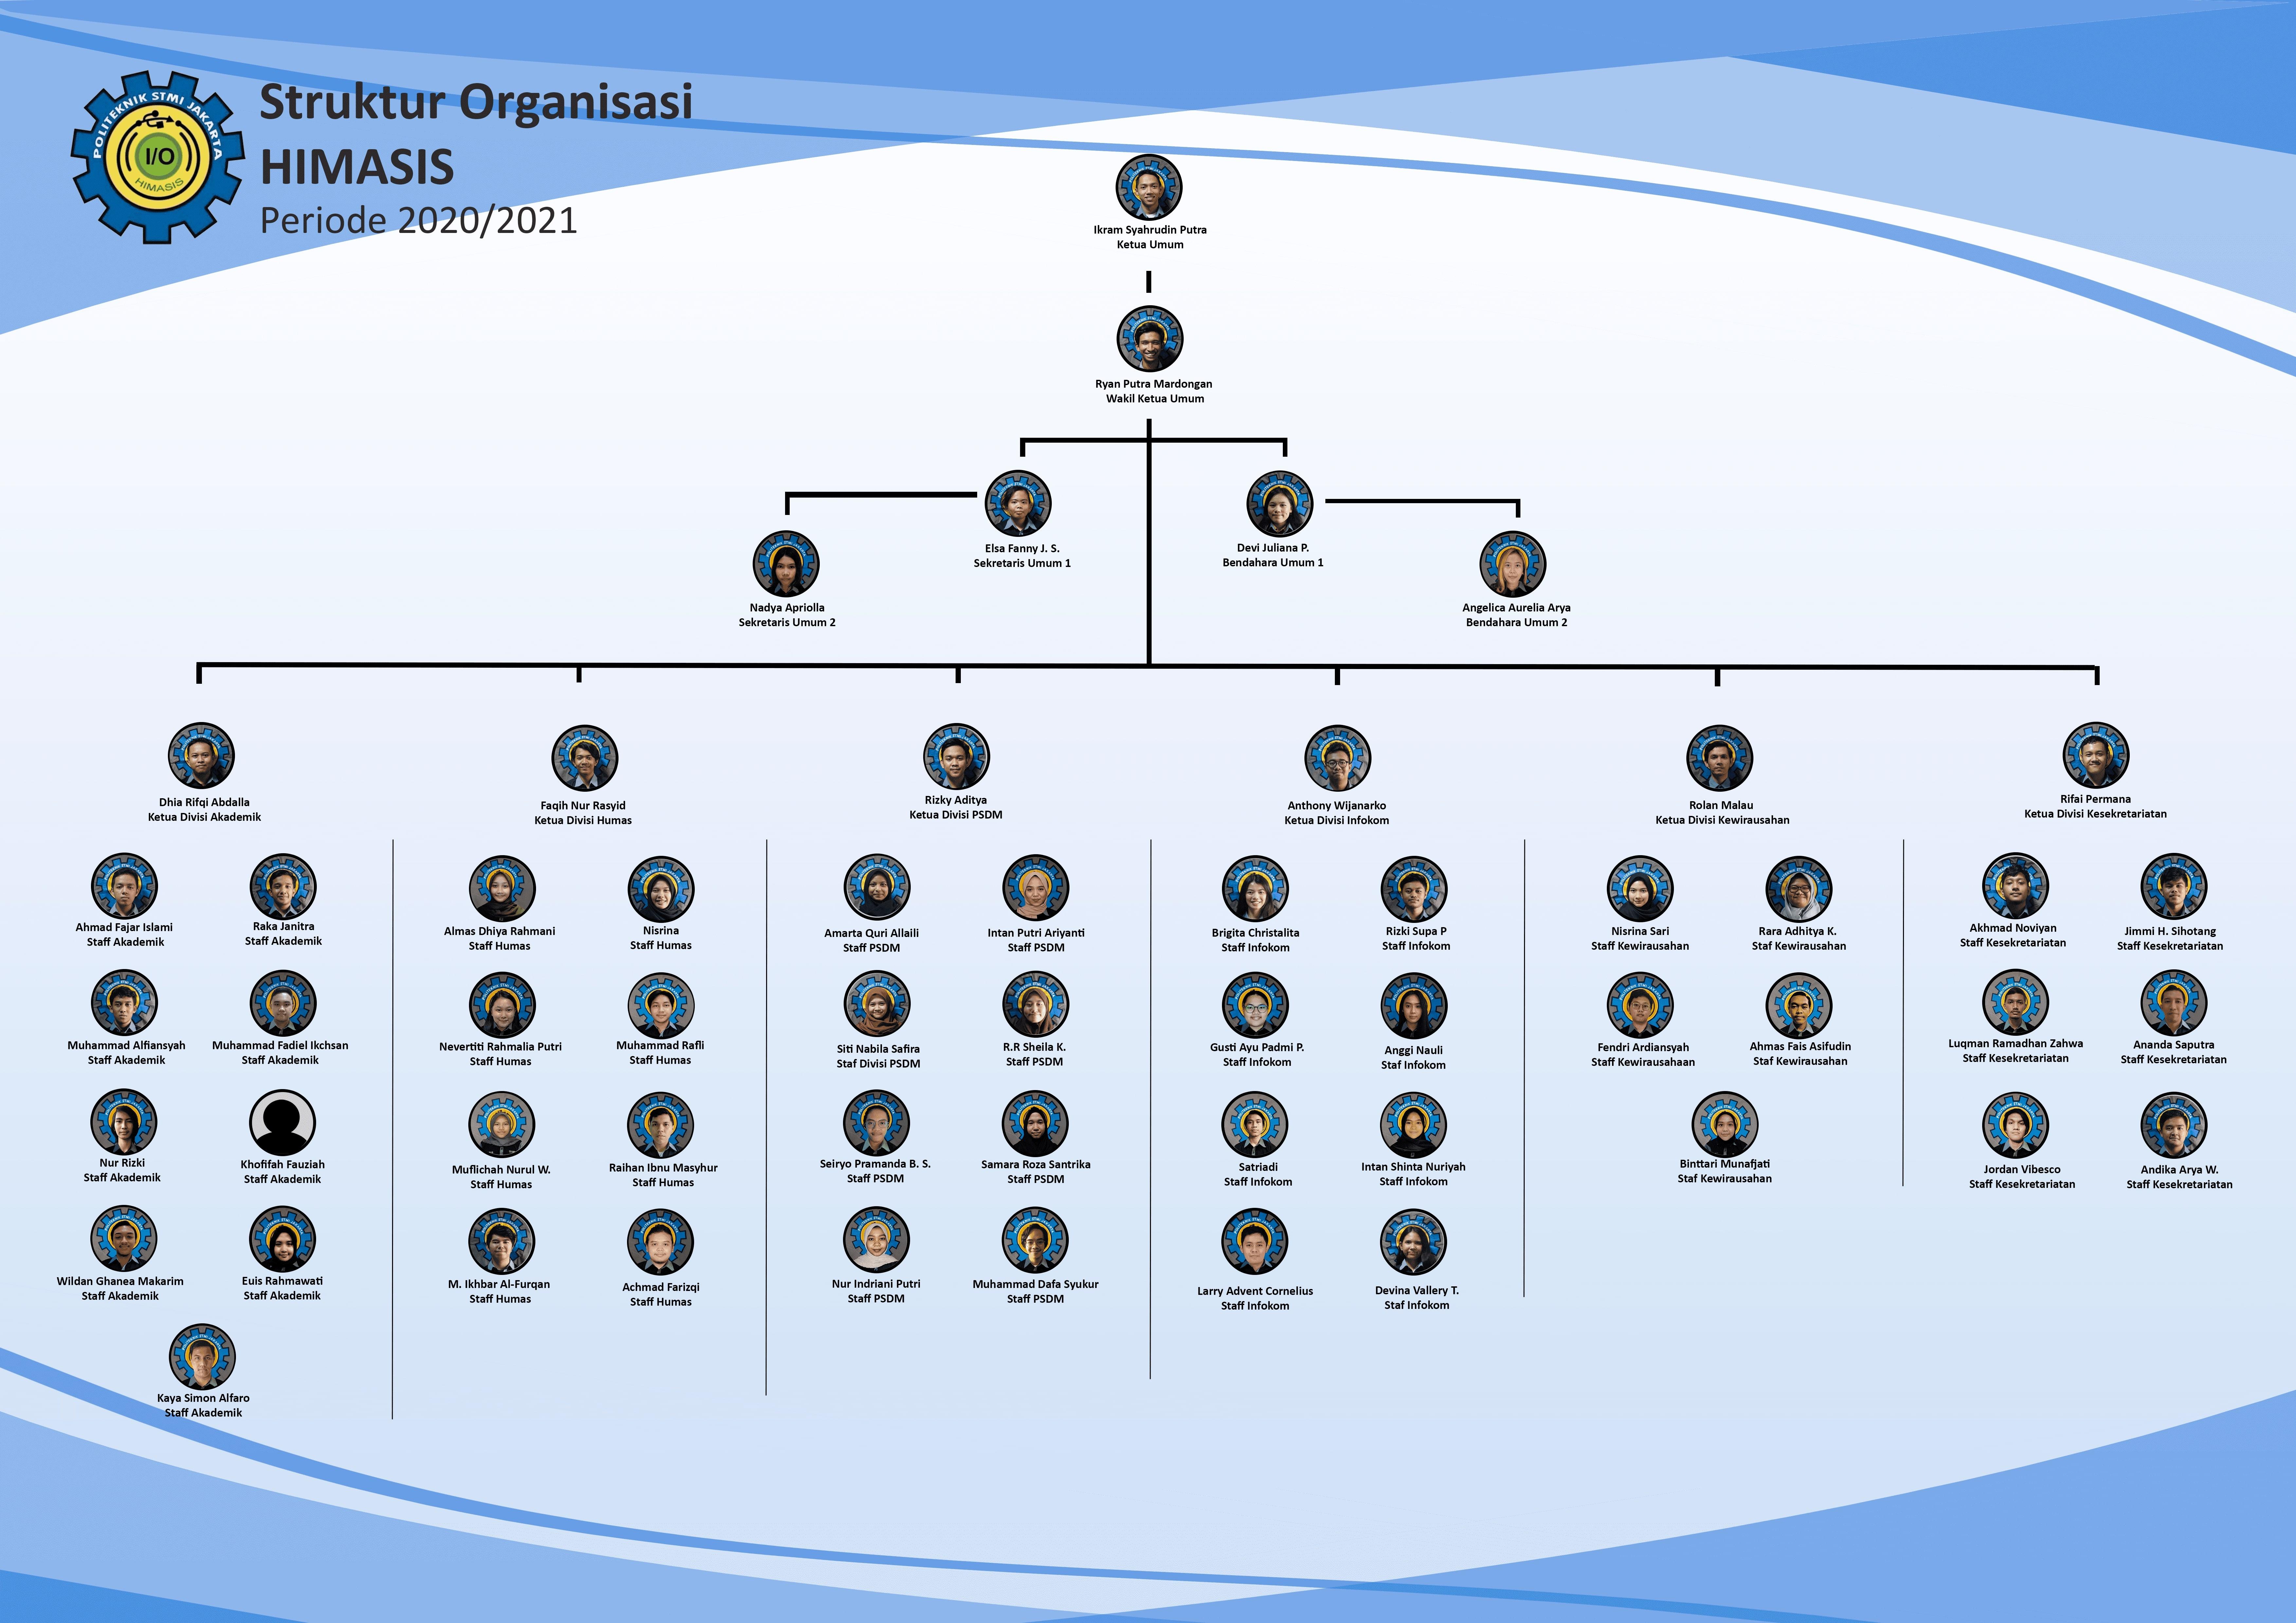 Struktur Organisasi HIMASIS Periode 2020/2021